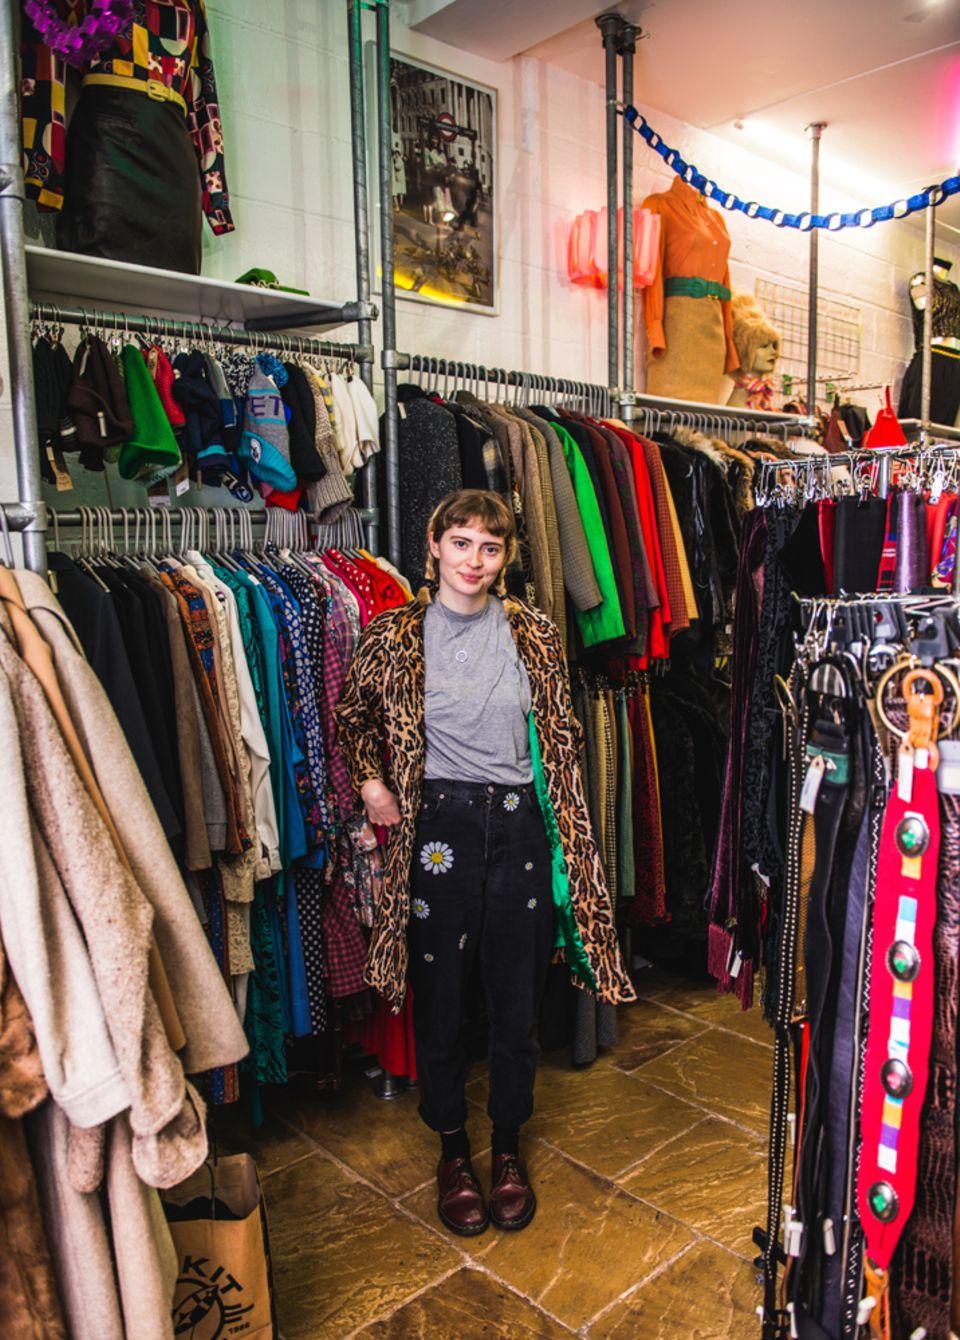 Sophie Slater im Rokit Clothing Shop, Brick Lane London